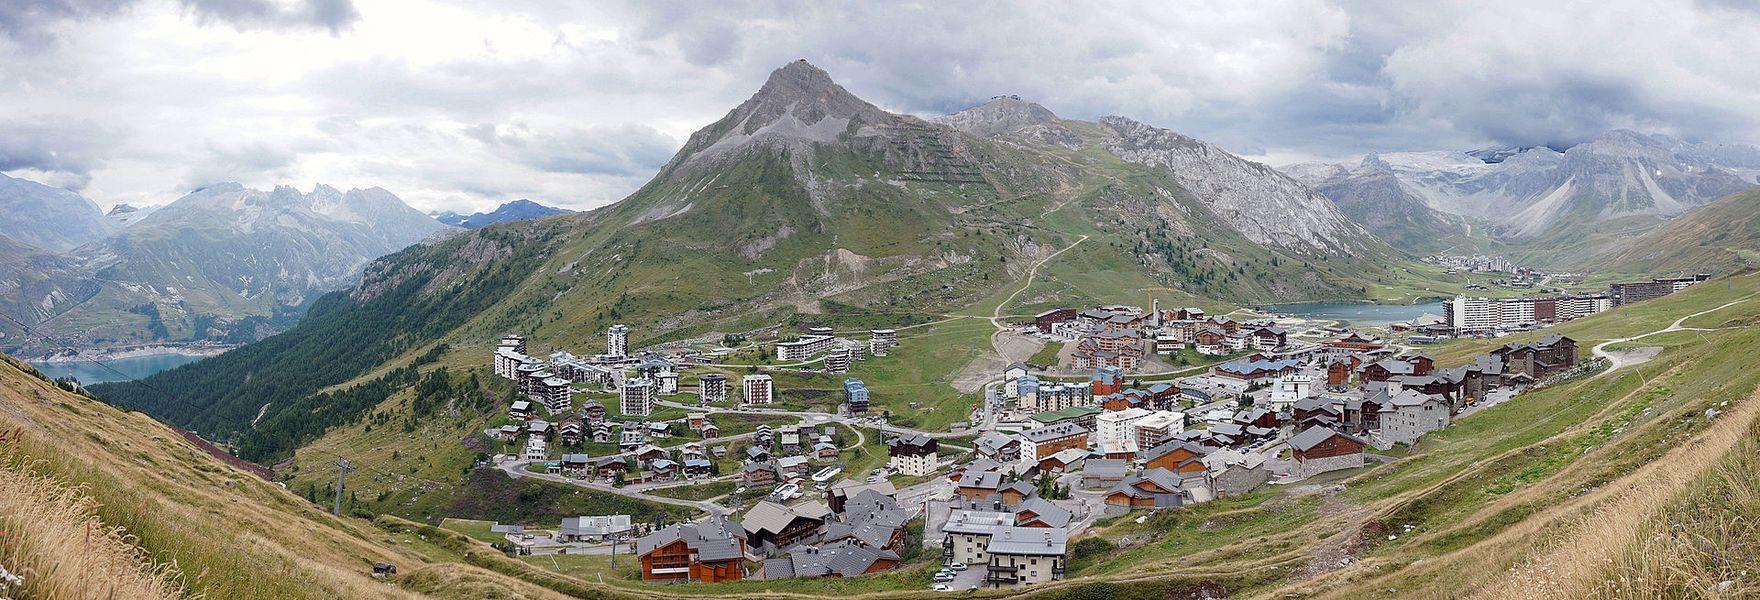 View to Tignes and Grande Motte.